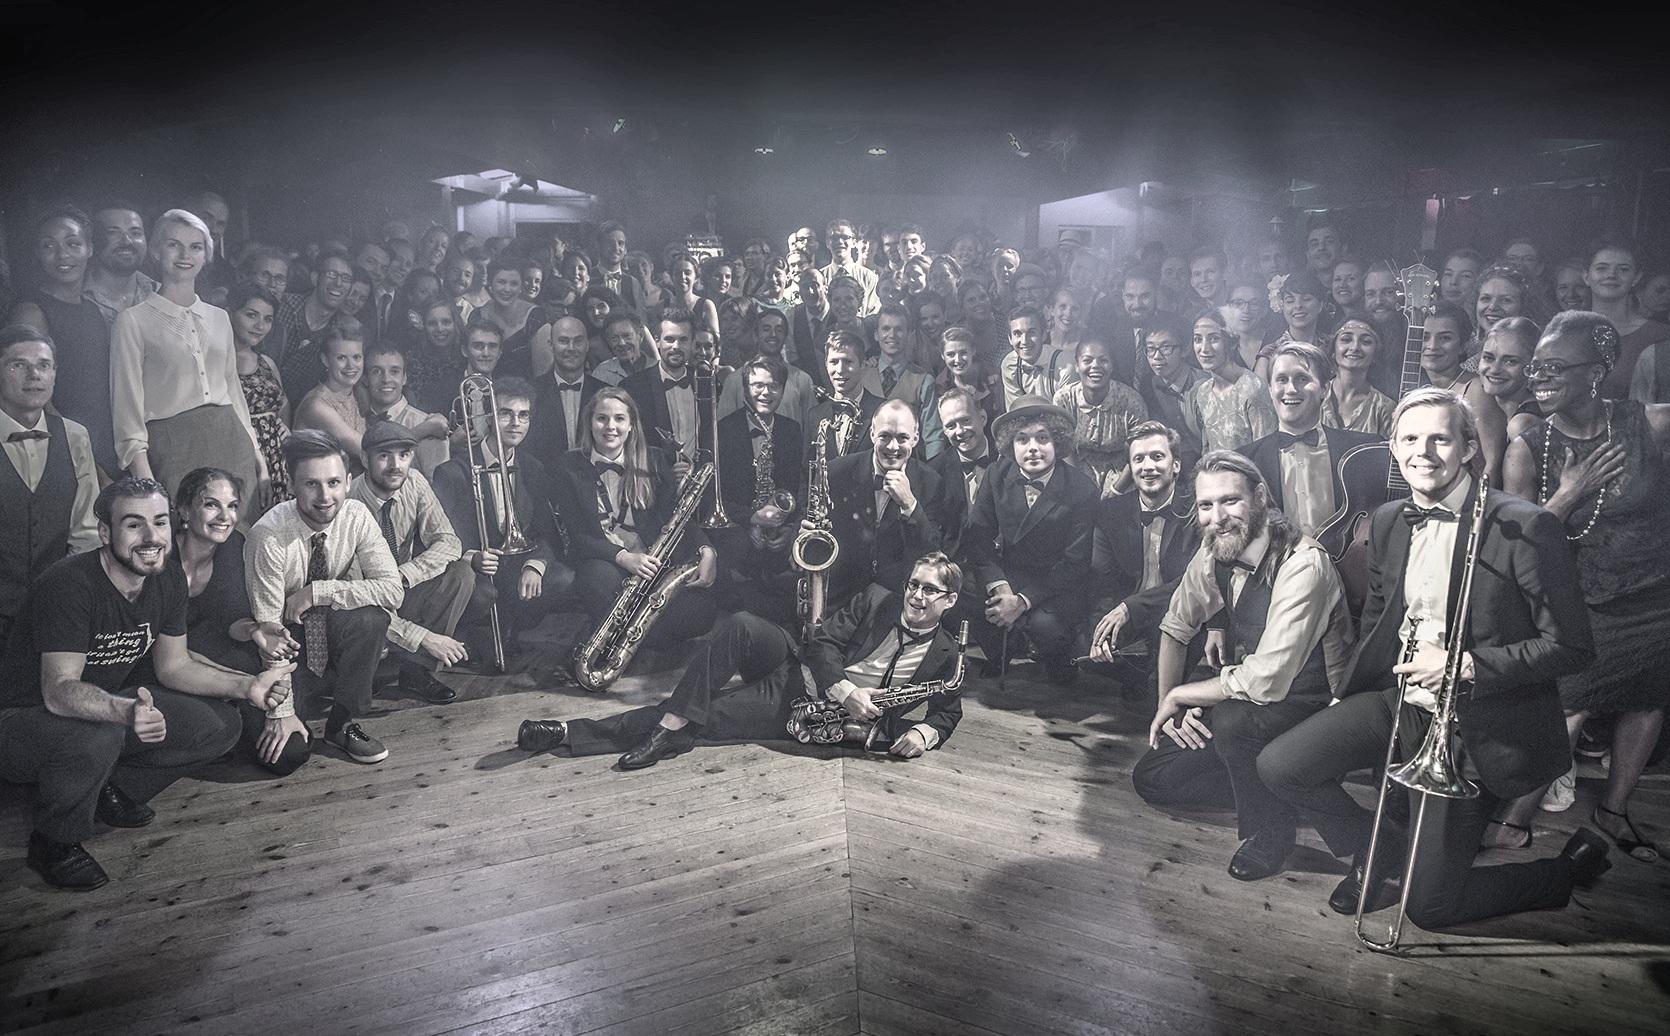 Photo The Swingharmonic Orchestra